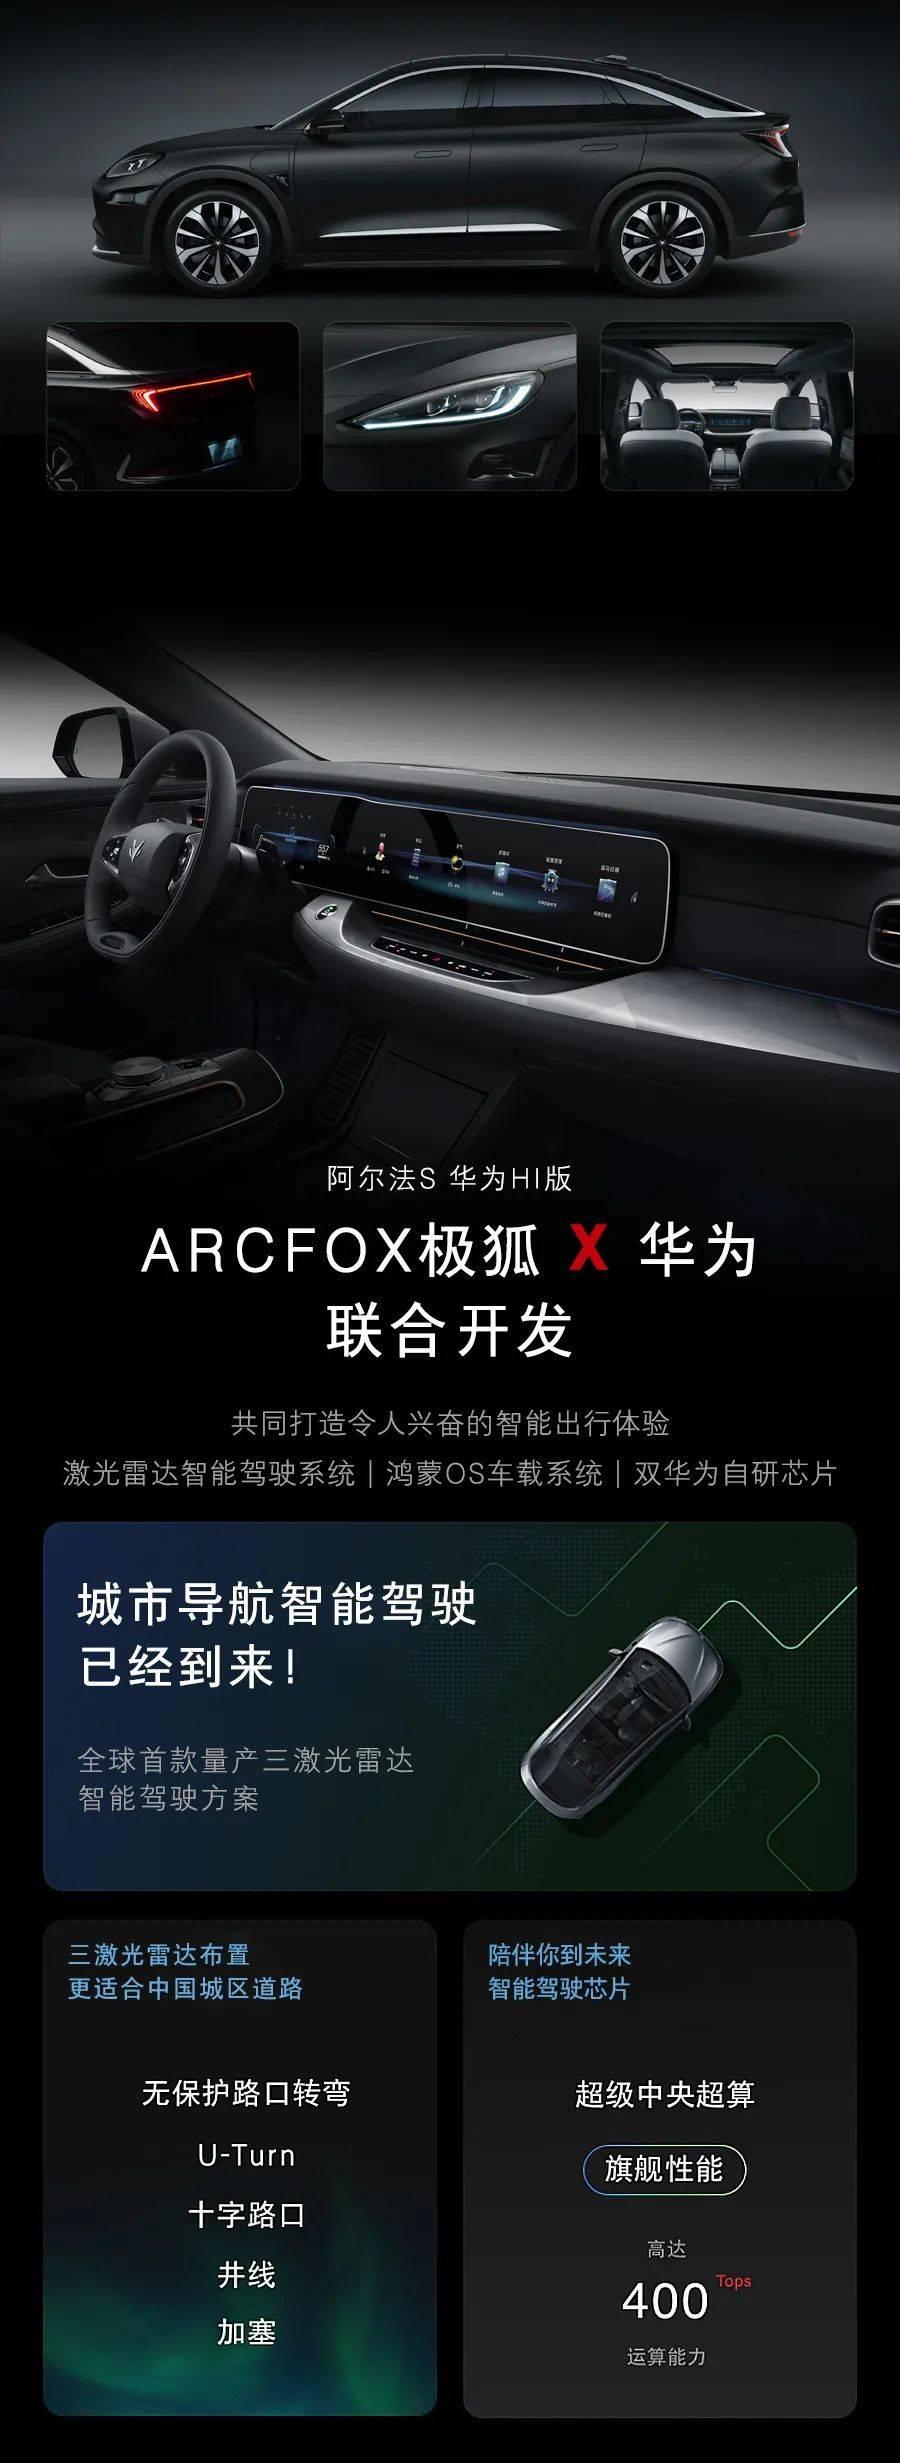 Huawei inside第一车令华为员工泪目:背后是数不清的英雄的照片 - 3